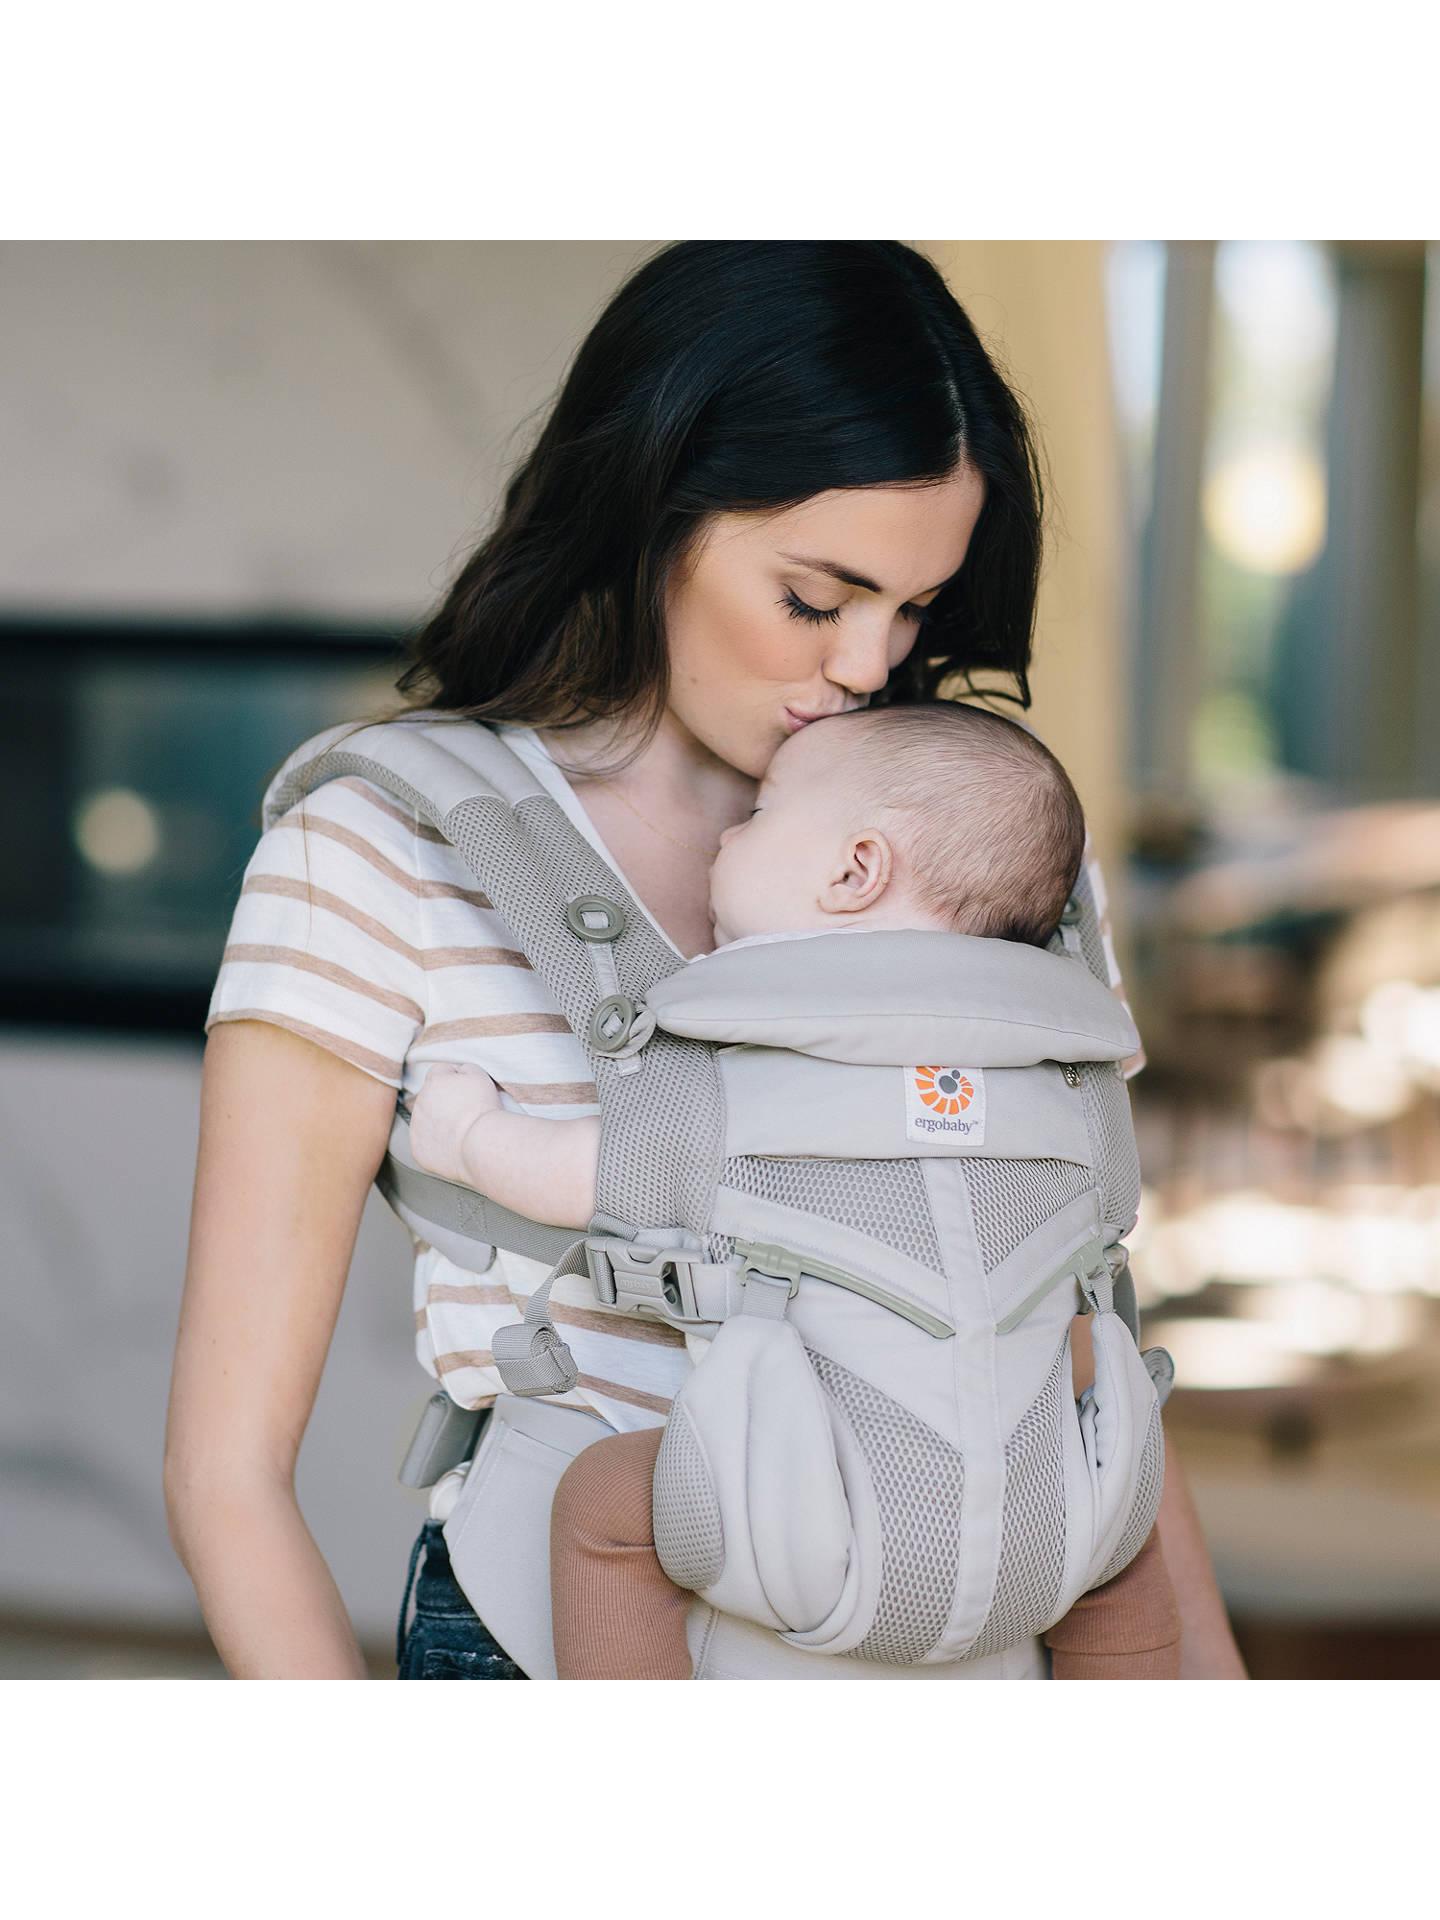 ab0418e53db Ergobaby Omni 360 Mesh Baby Carrier at John Lewis   Partners